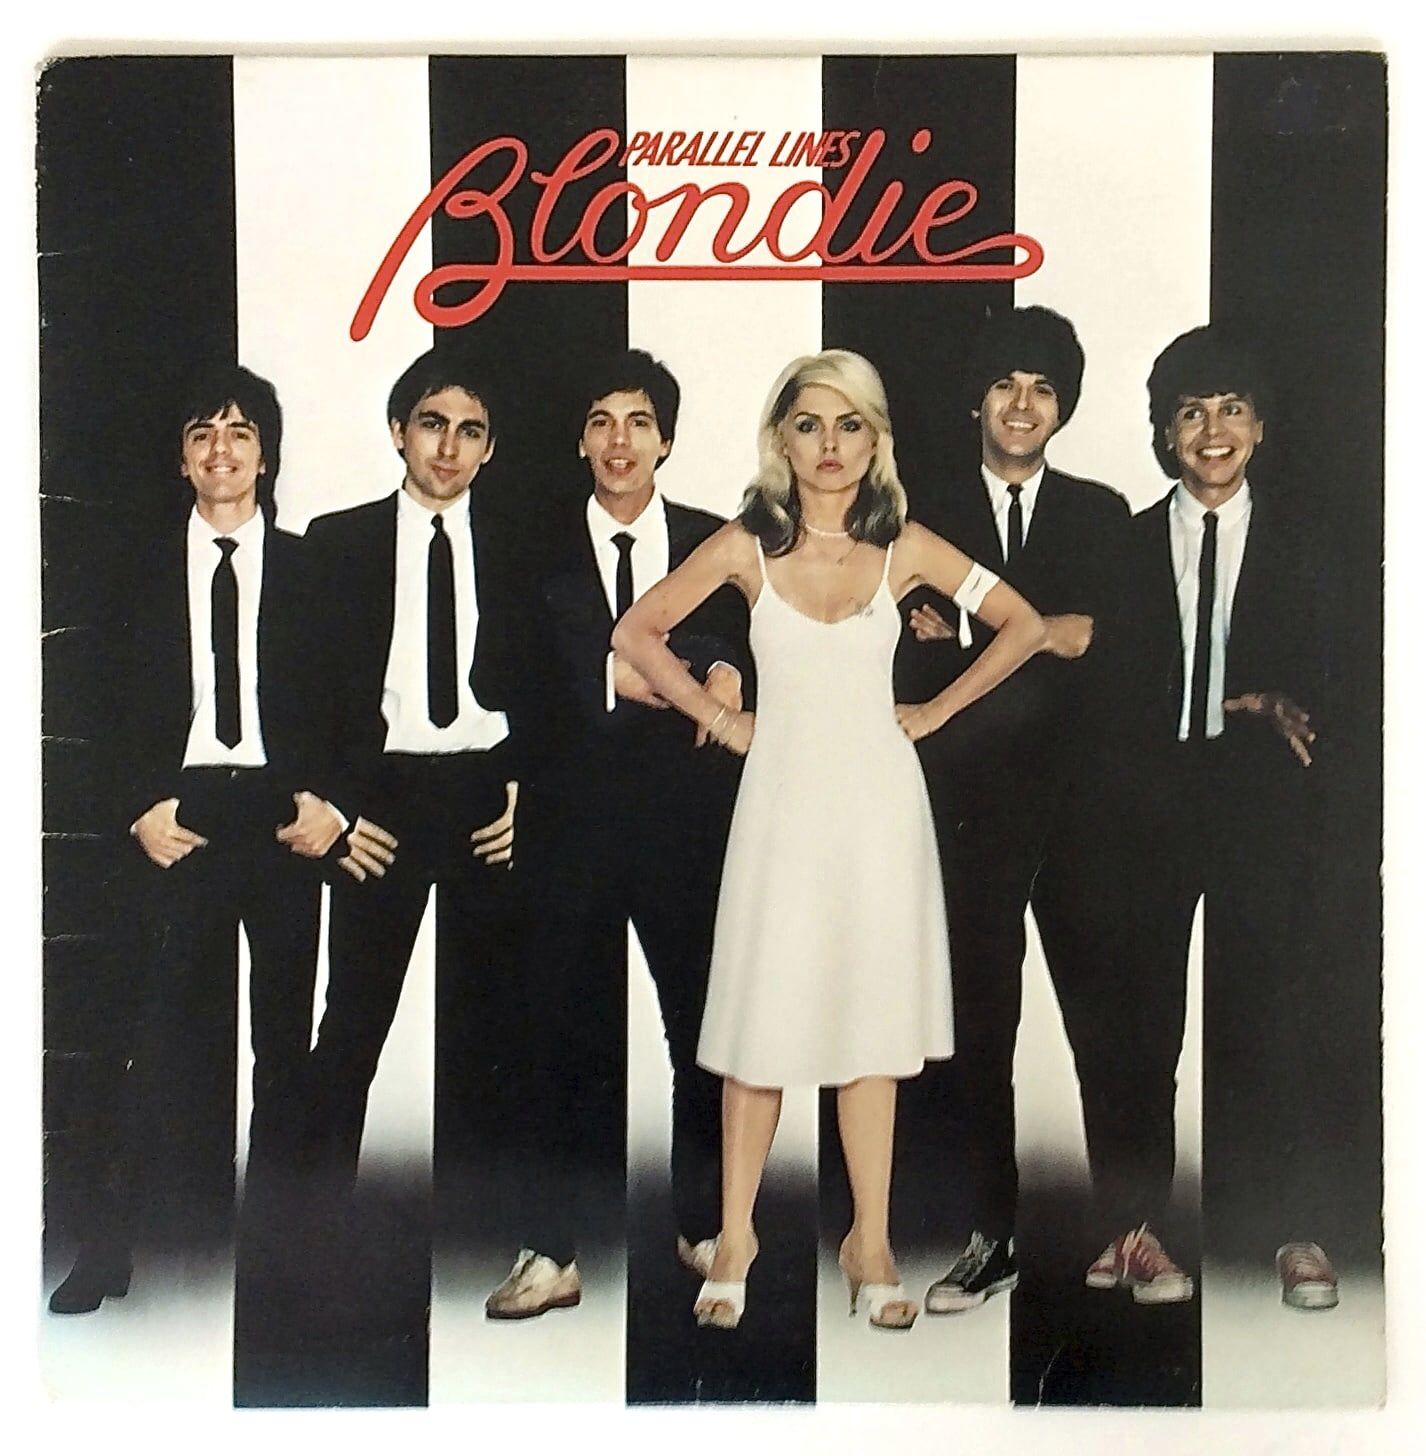 Blondie Parallel Lines Lp Iconic Album Covers Greatest Album Covers Blondie Albums